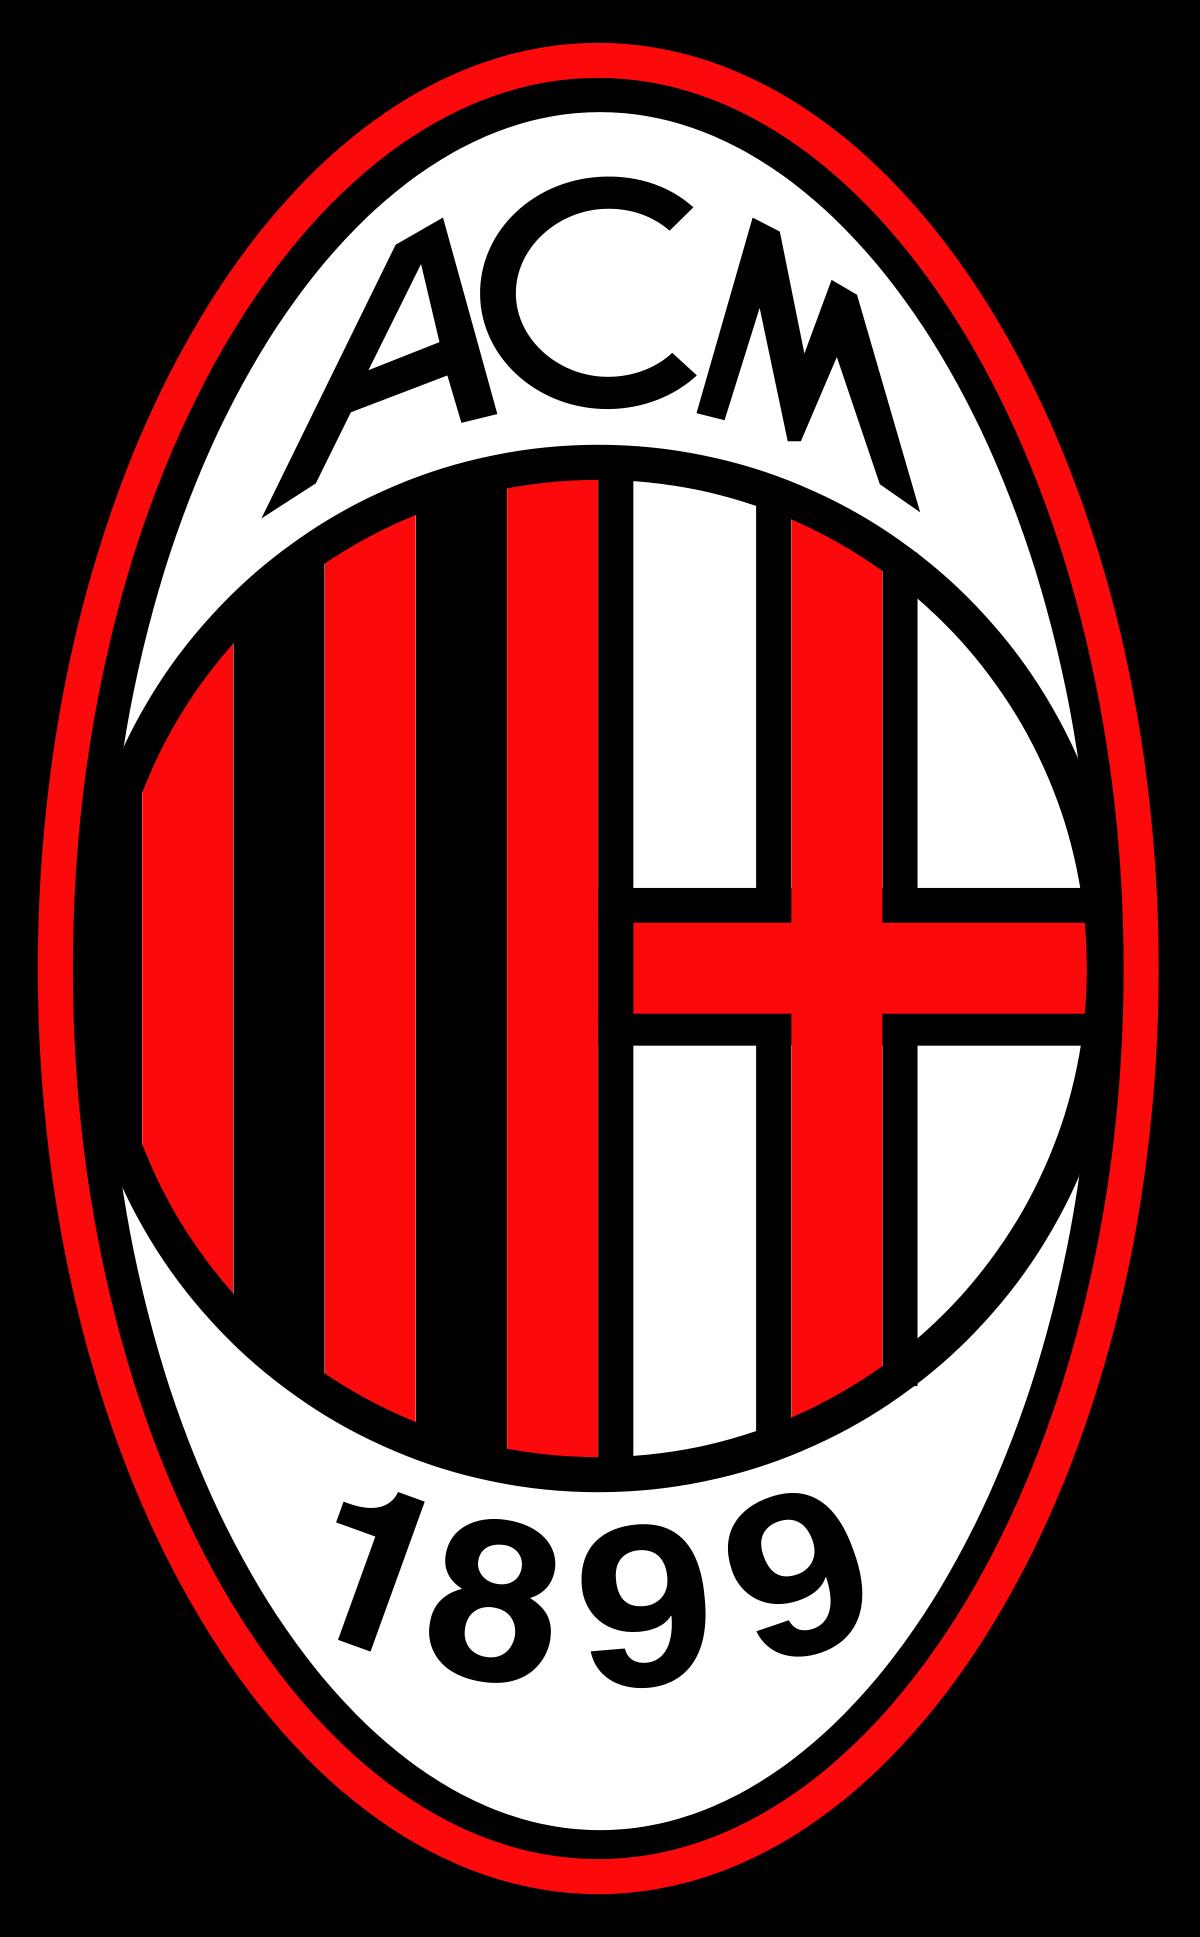 milan logo 2 - Milan Logo - Milan Escudo